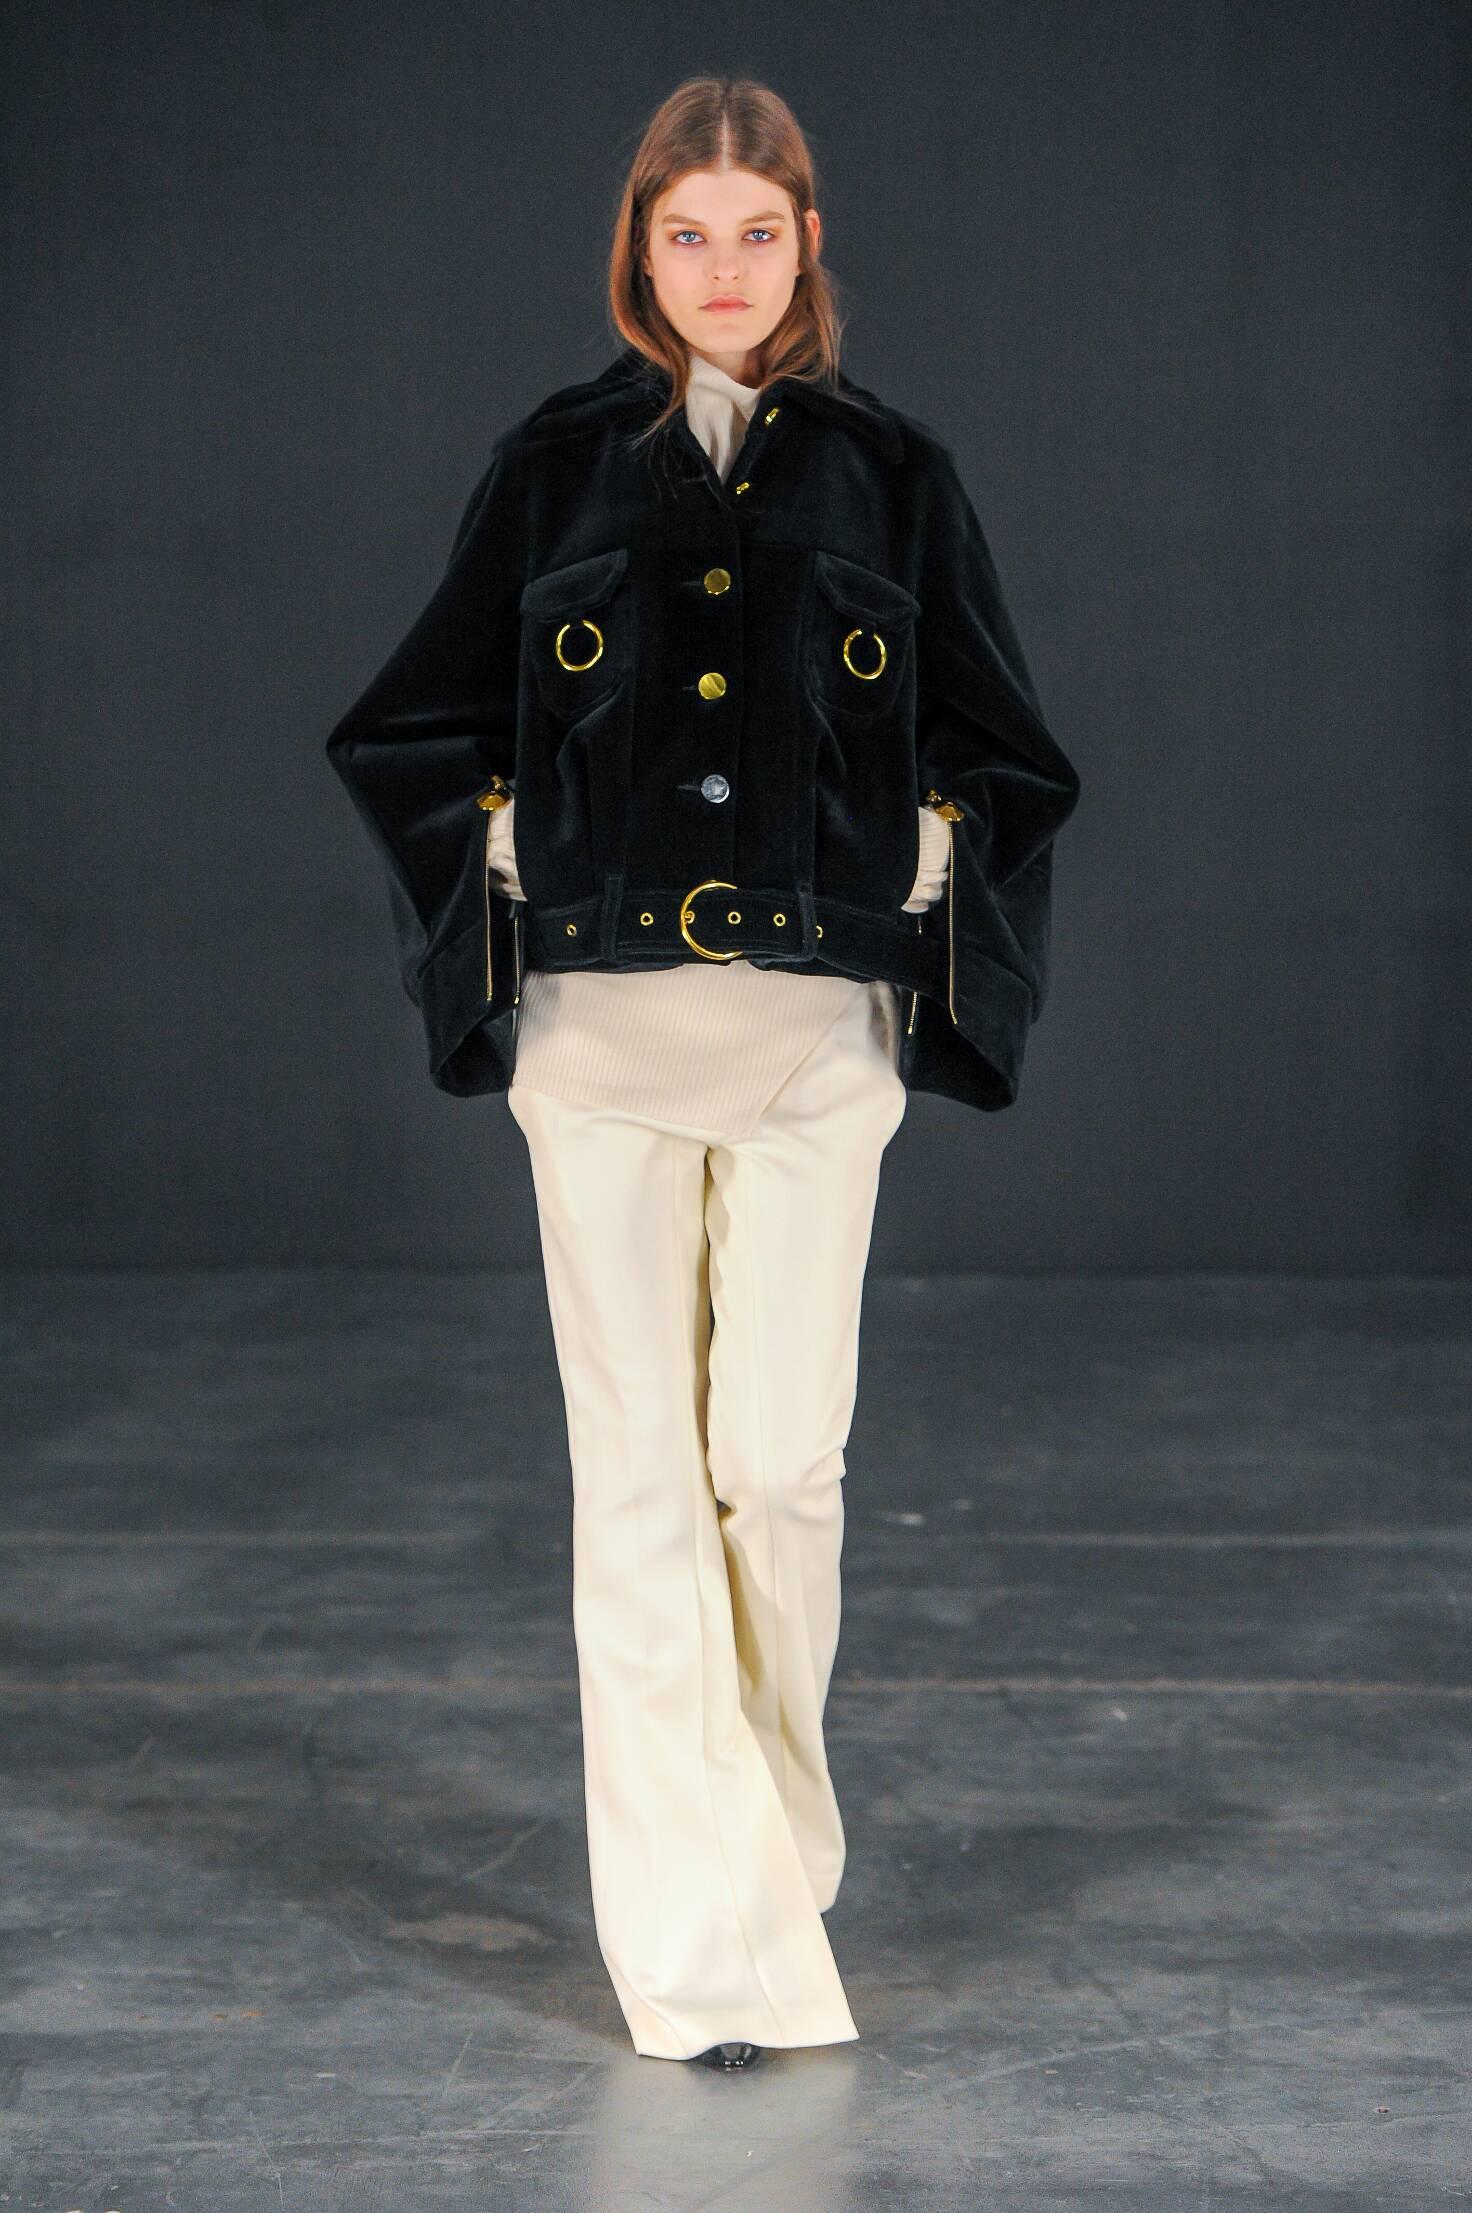 Fall Thomas Tait Collection Fashion Women Model